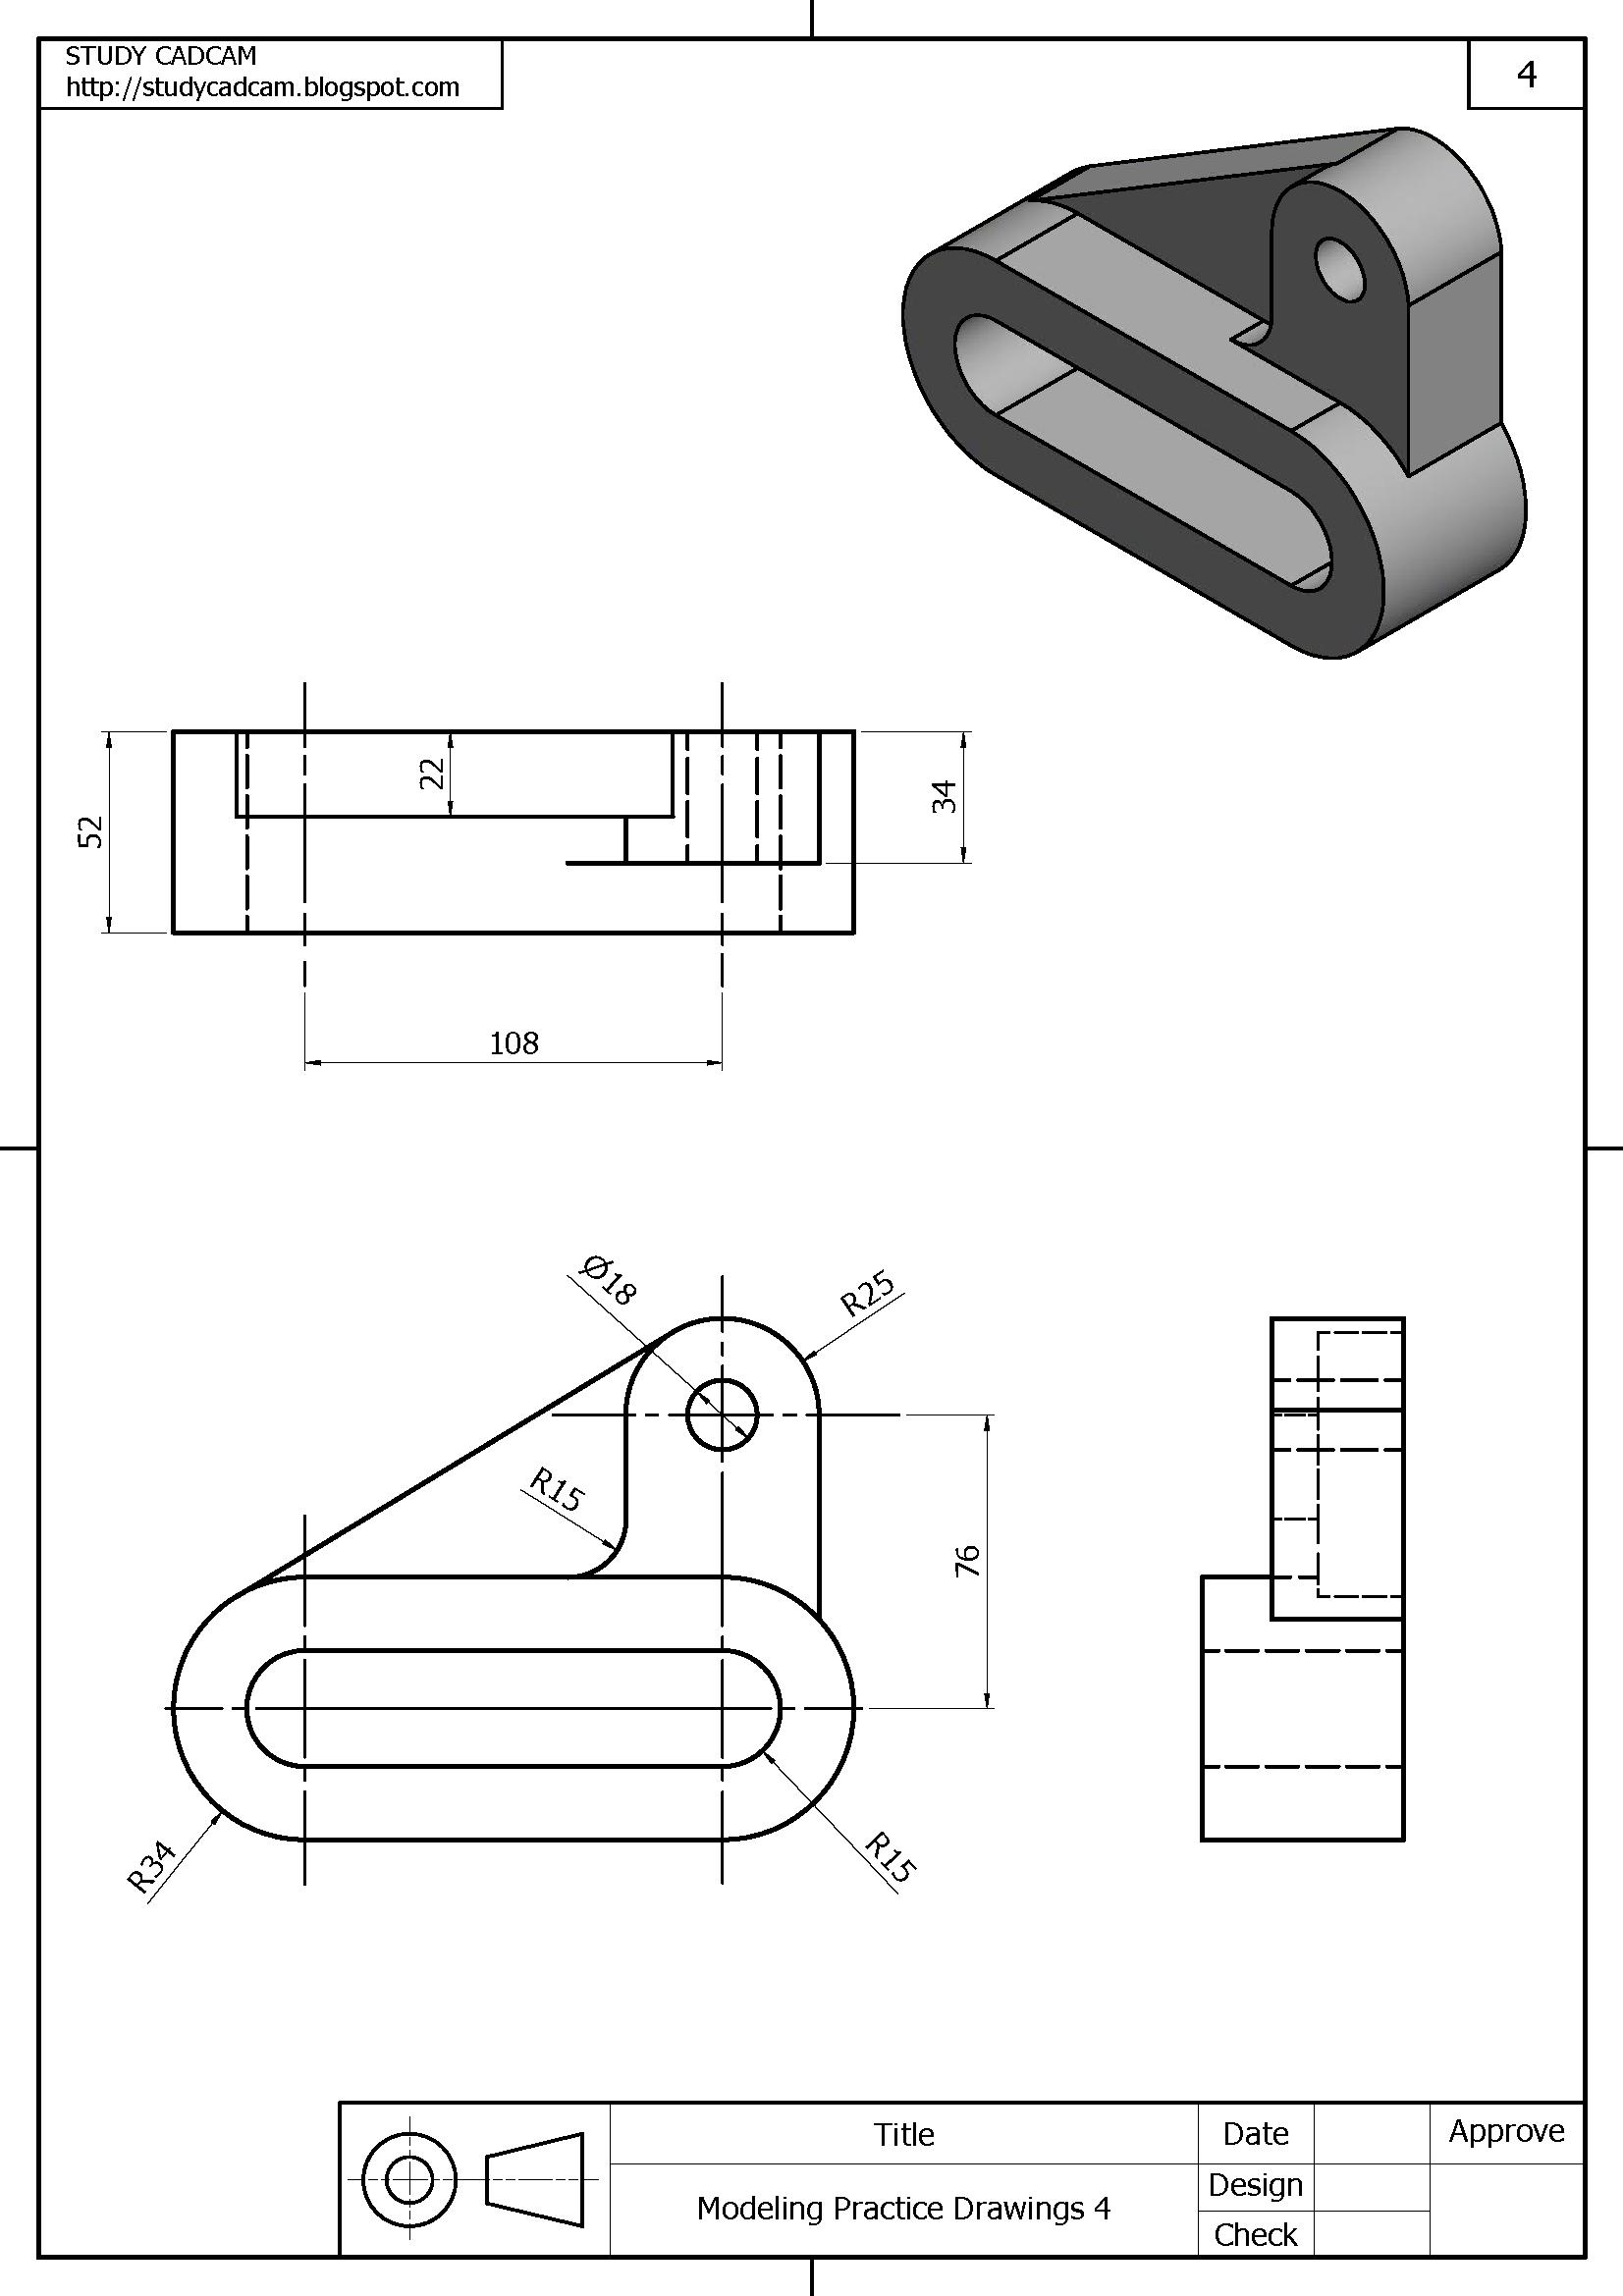 Pin by Muhammad Shafiq Bhatti on Autocad Design in 2019